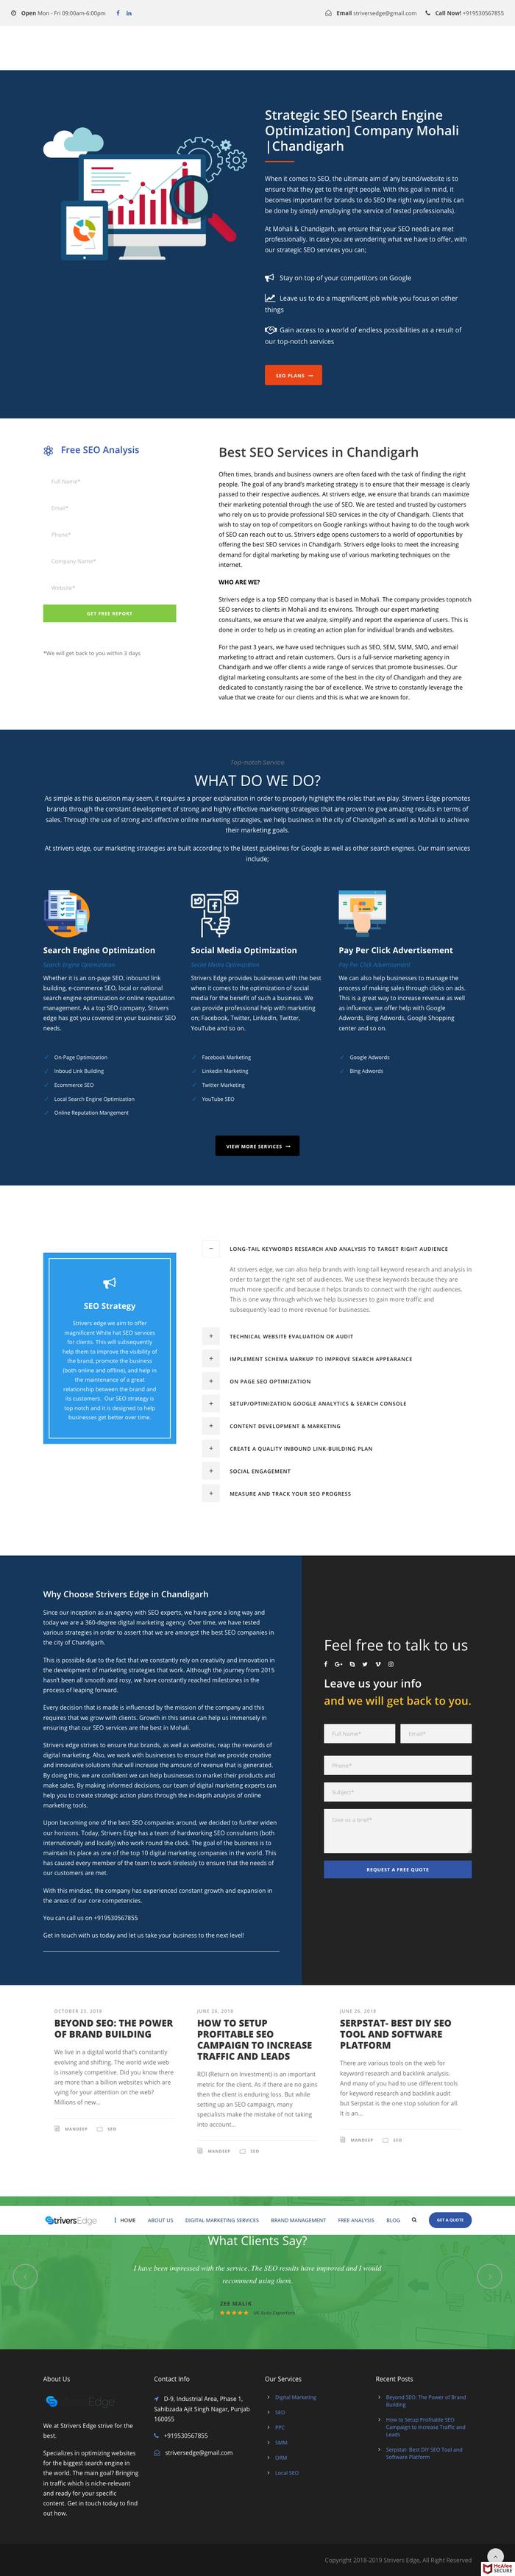 Strivers Edge website 2